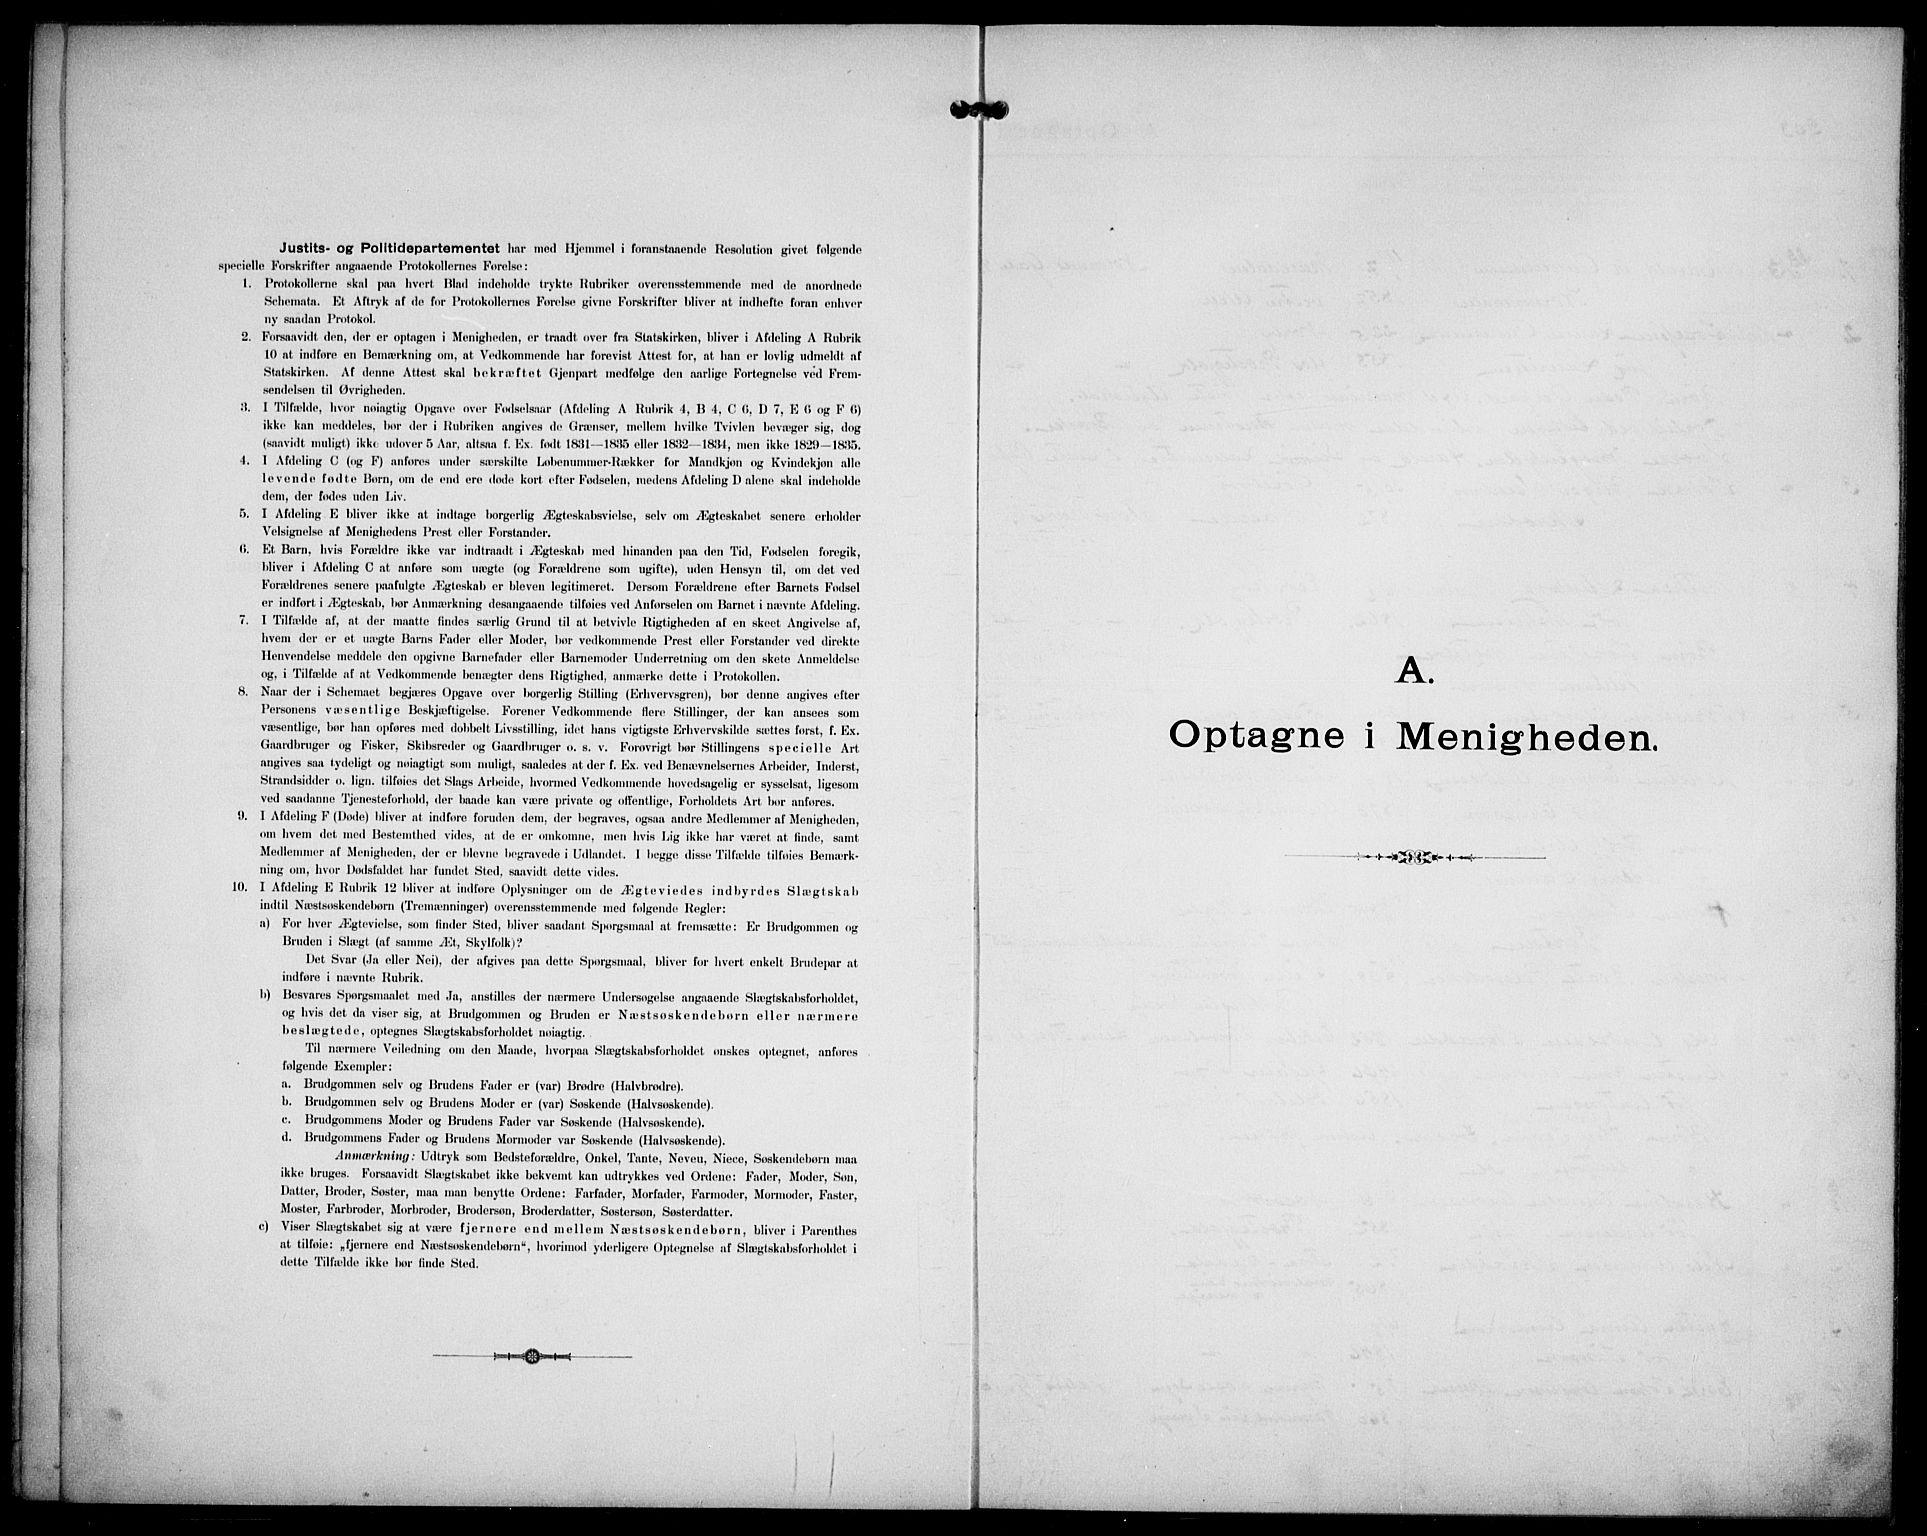 SAO, Kristi menighet Oslo , A/L0001: Dissenterprotokoll nr. 1, 1903-1938